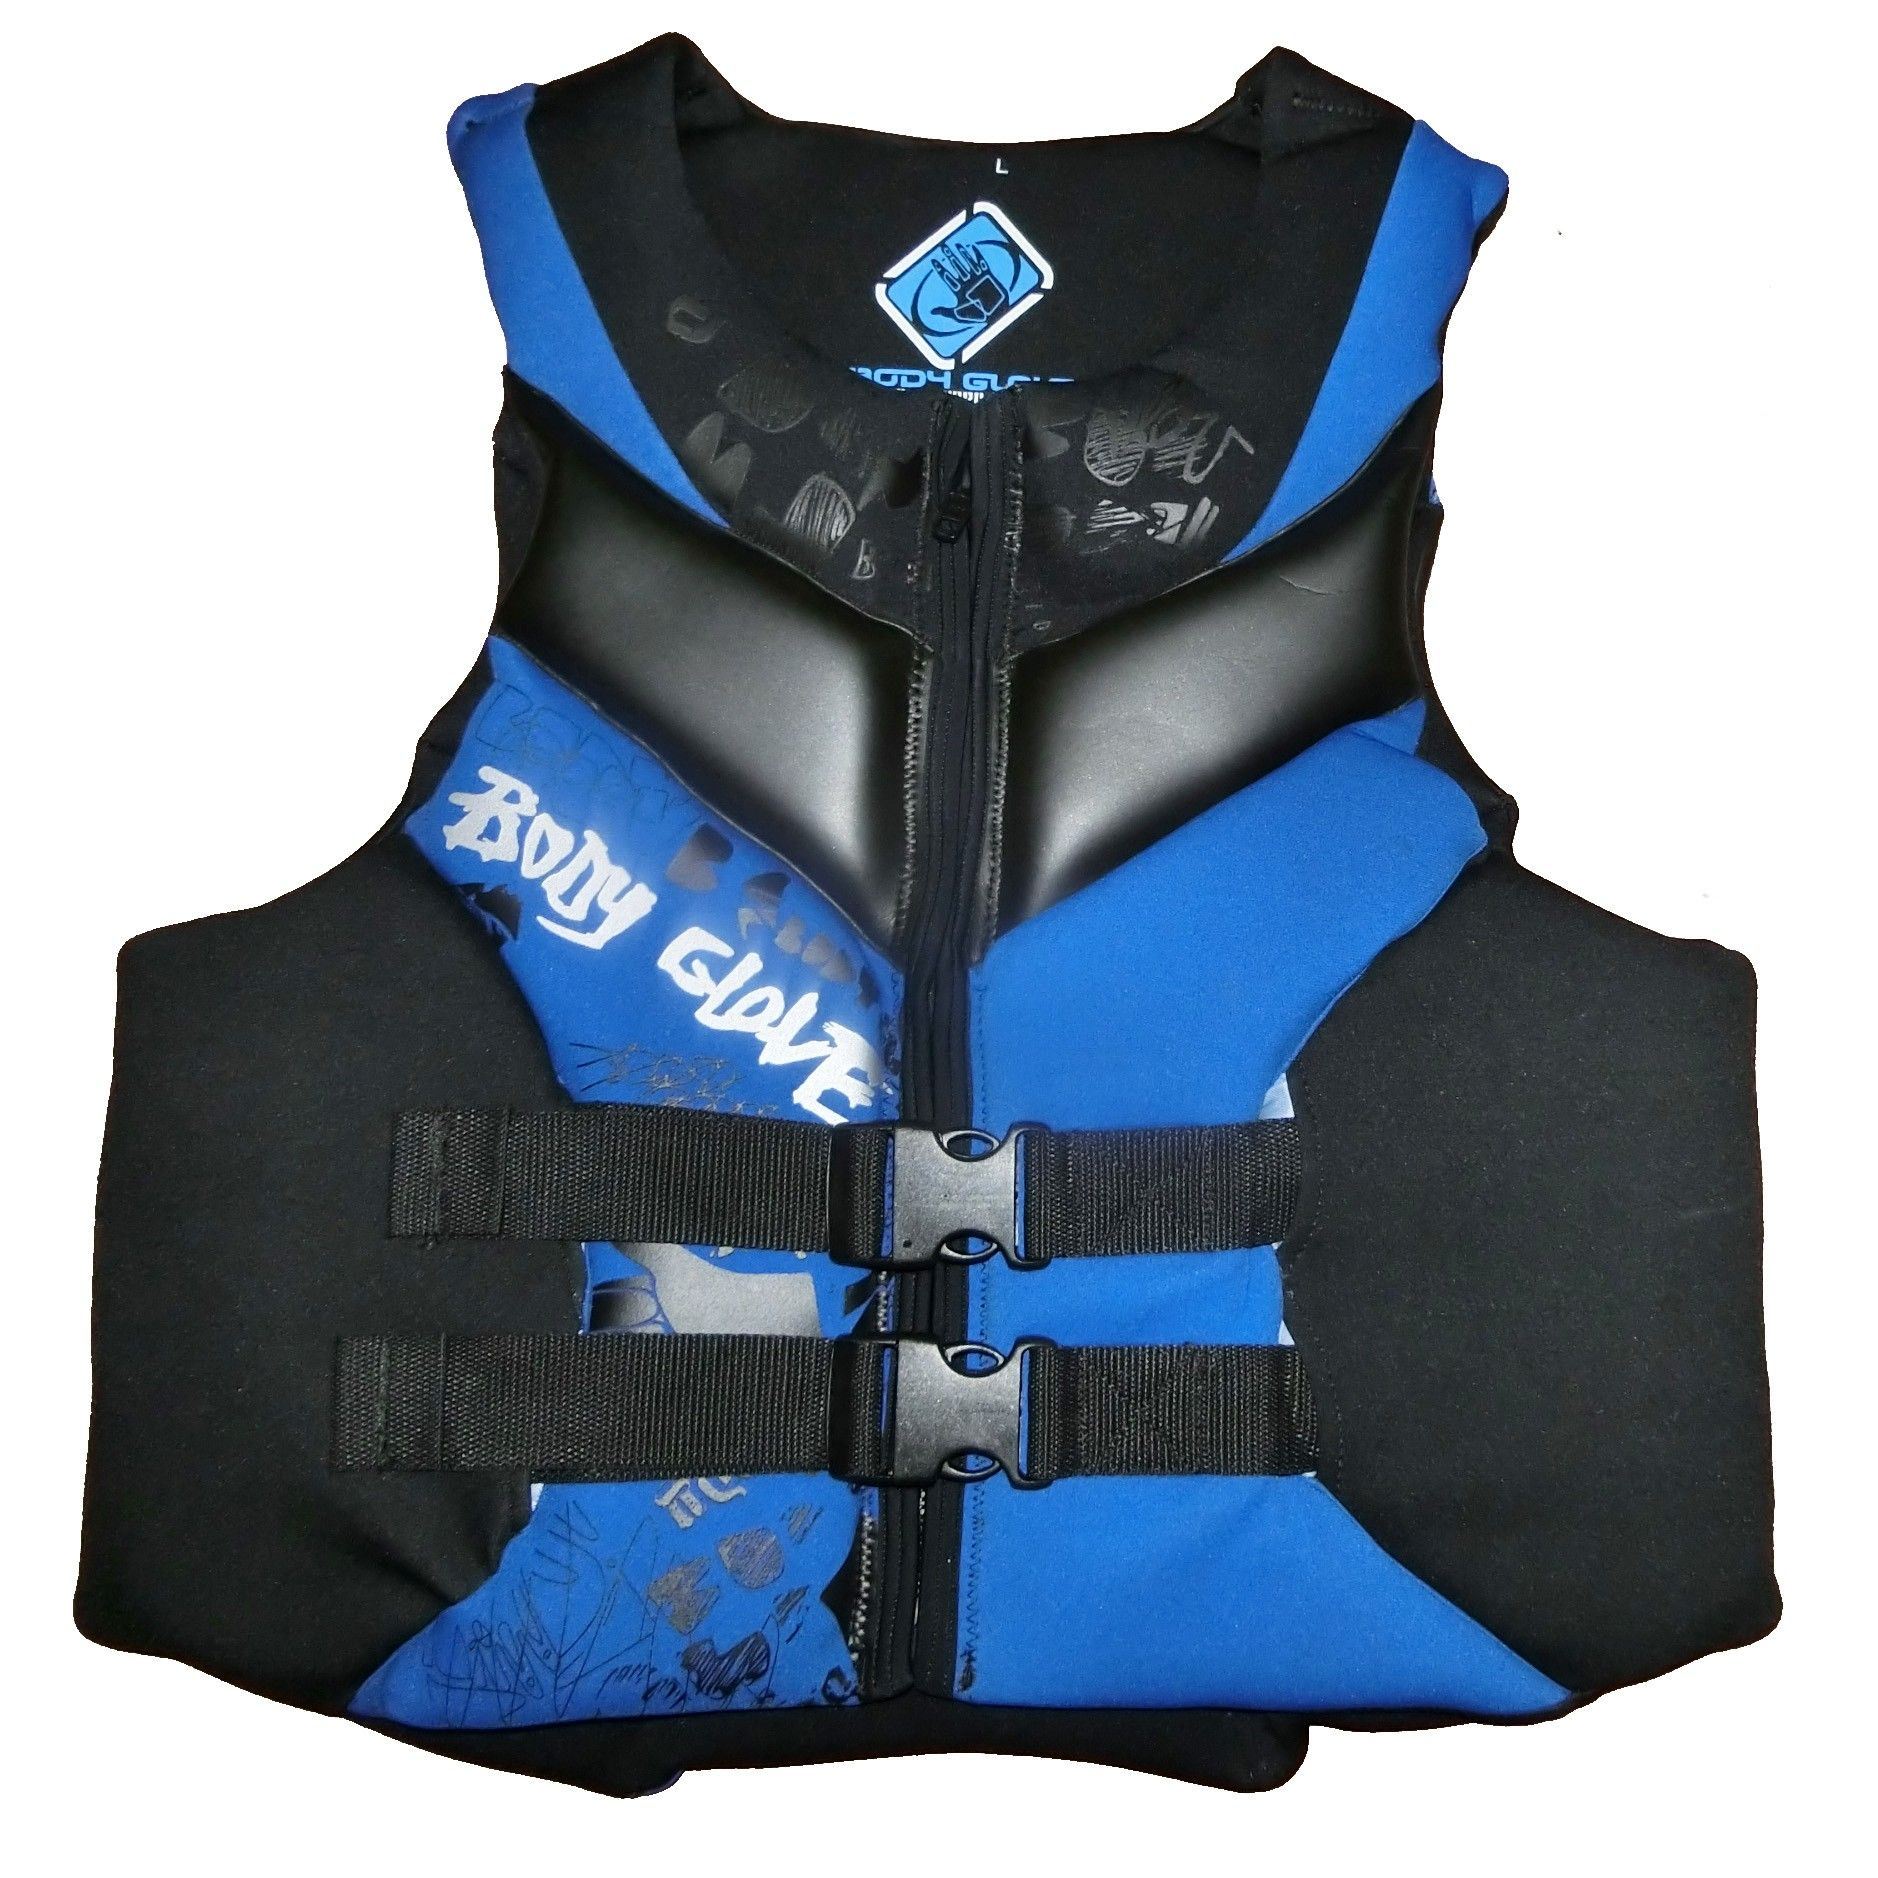 Спасательный жилет Body glove fyx/bg4068 Body glove